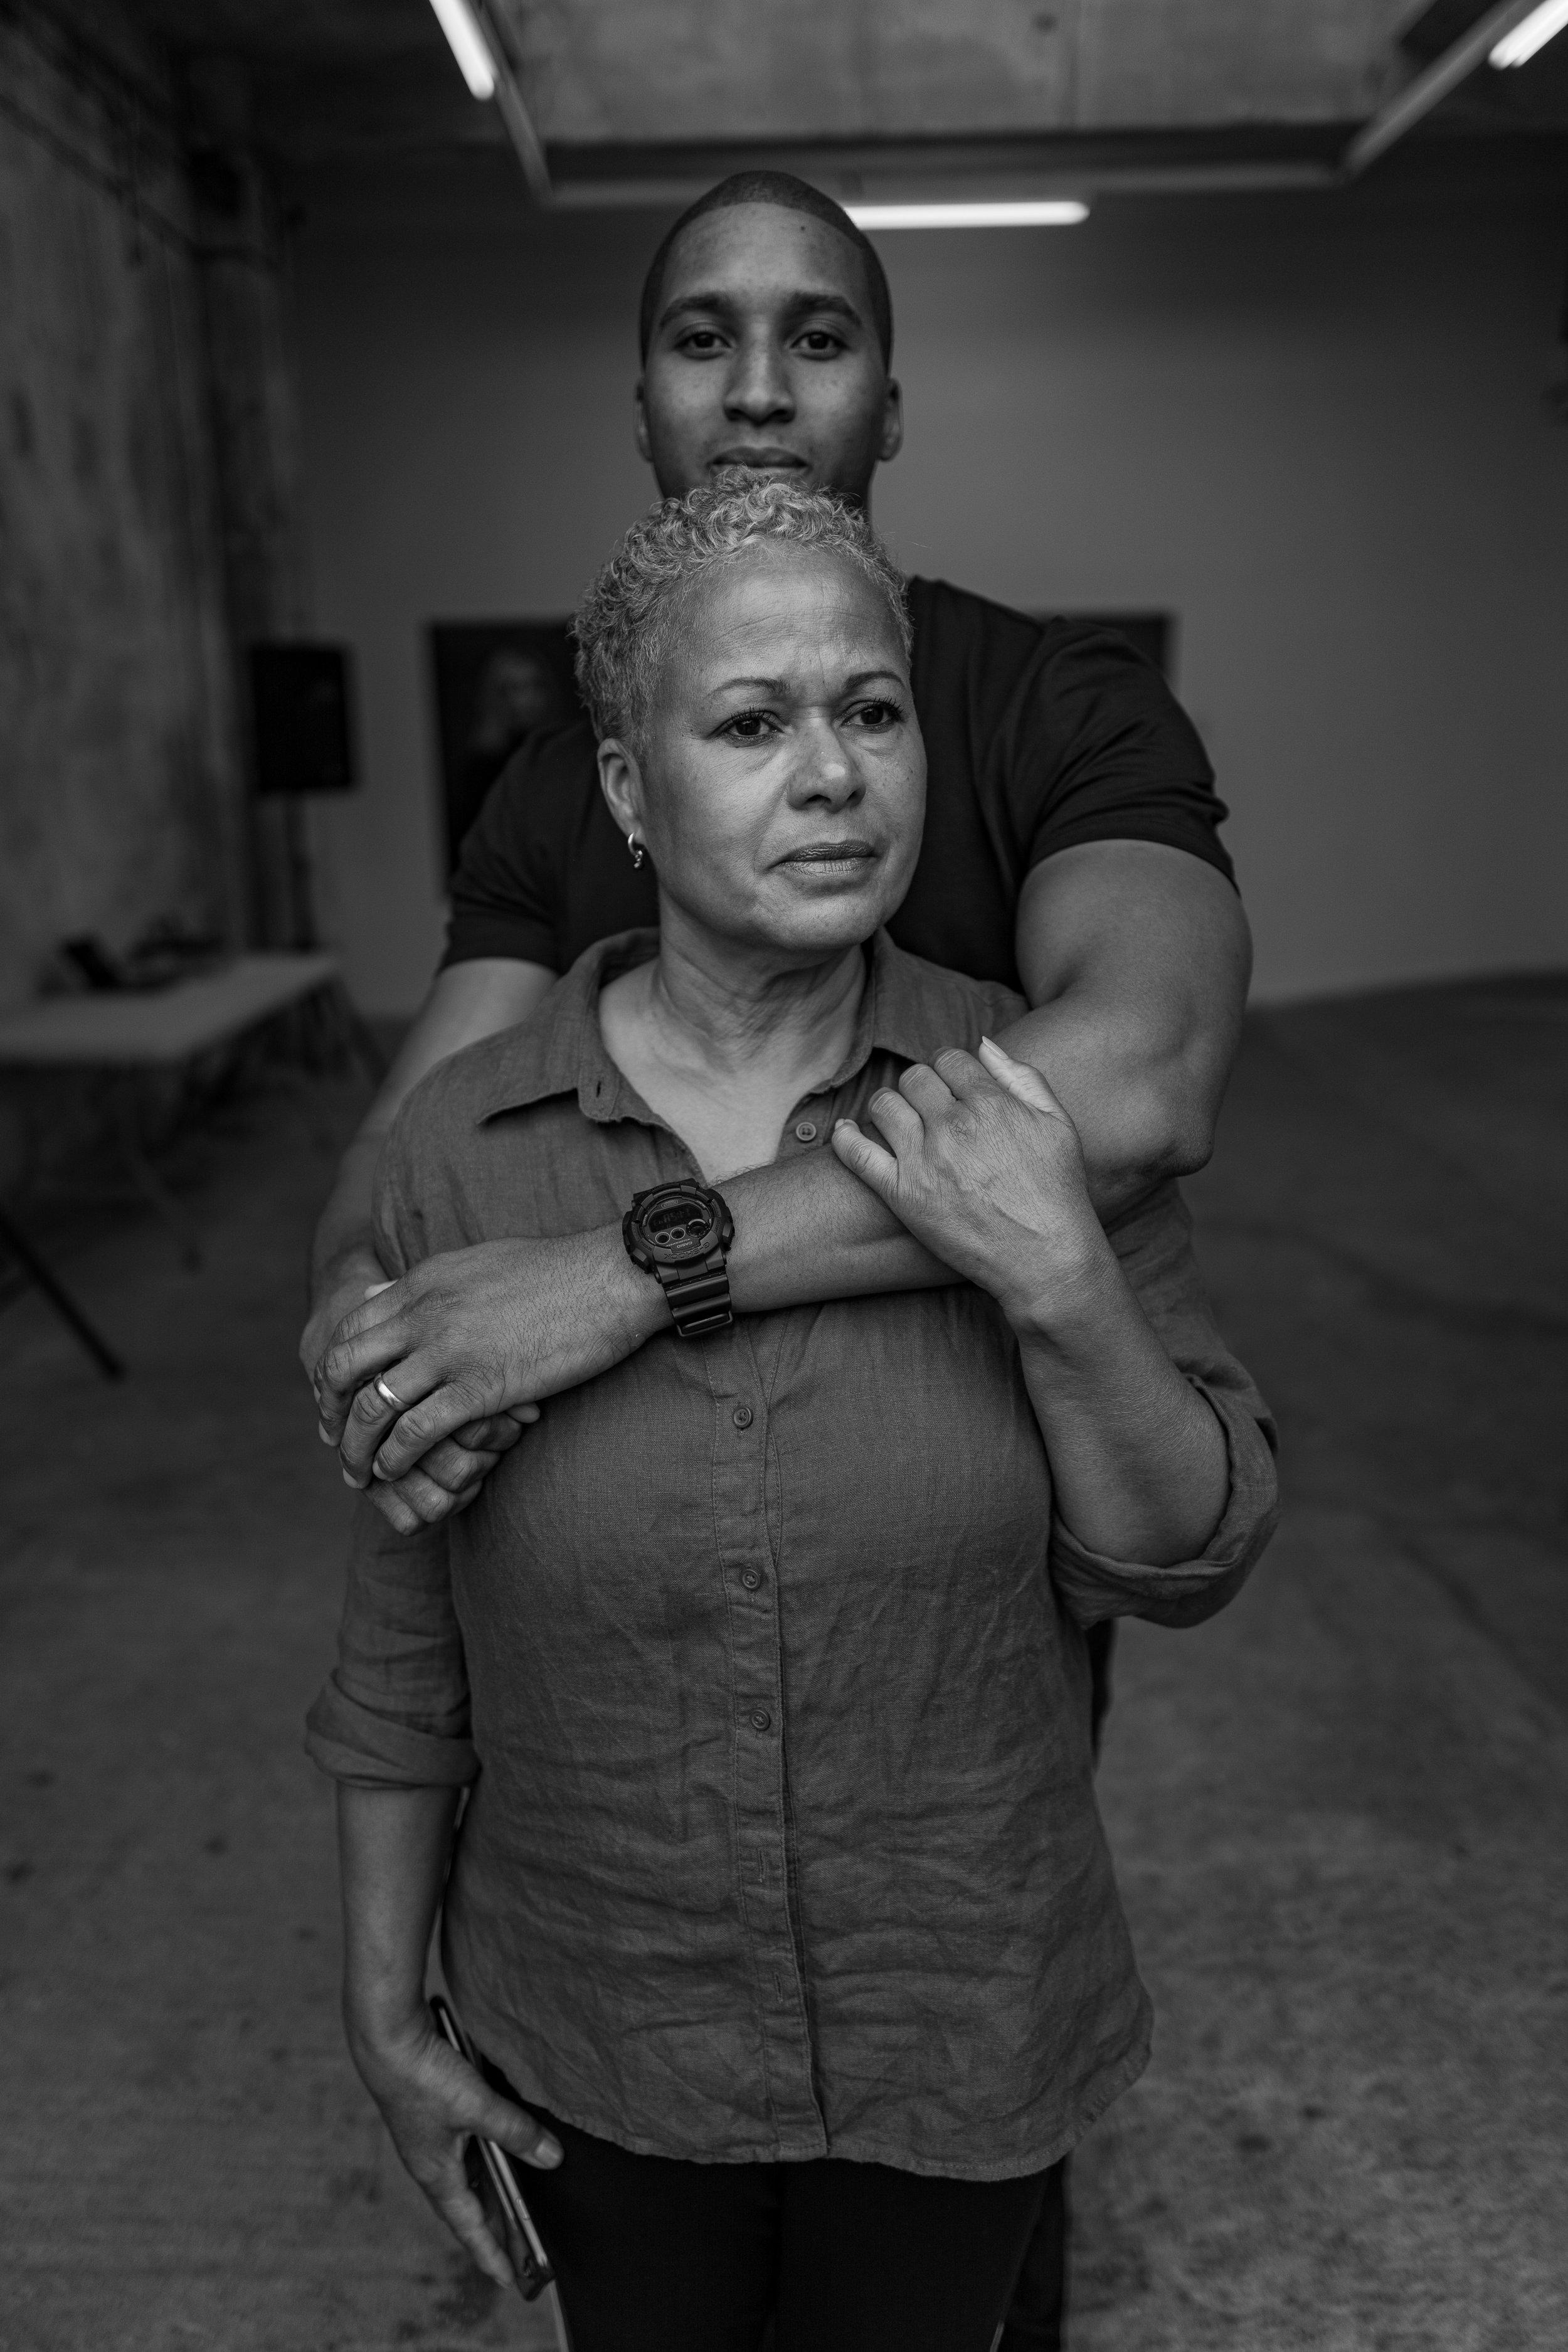 Tenee Attoh and her son Solon (image via photographer Misan Harriman)